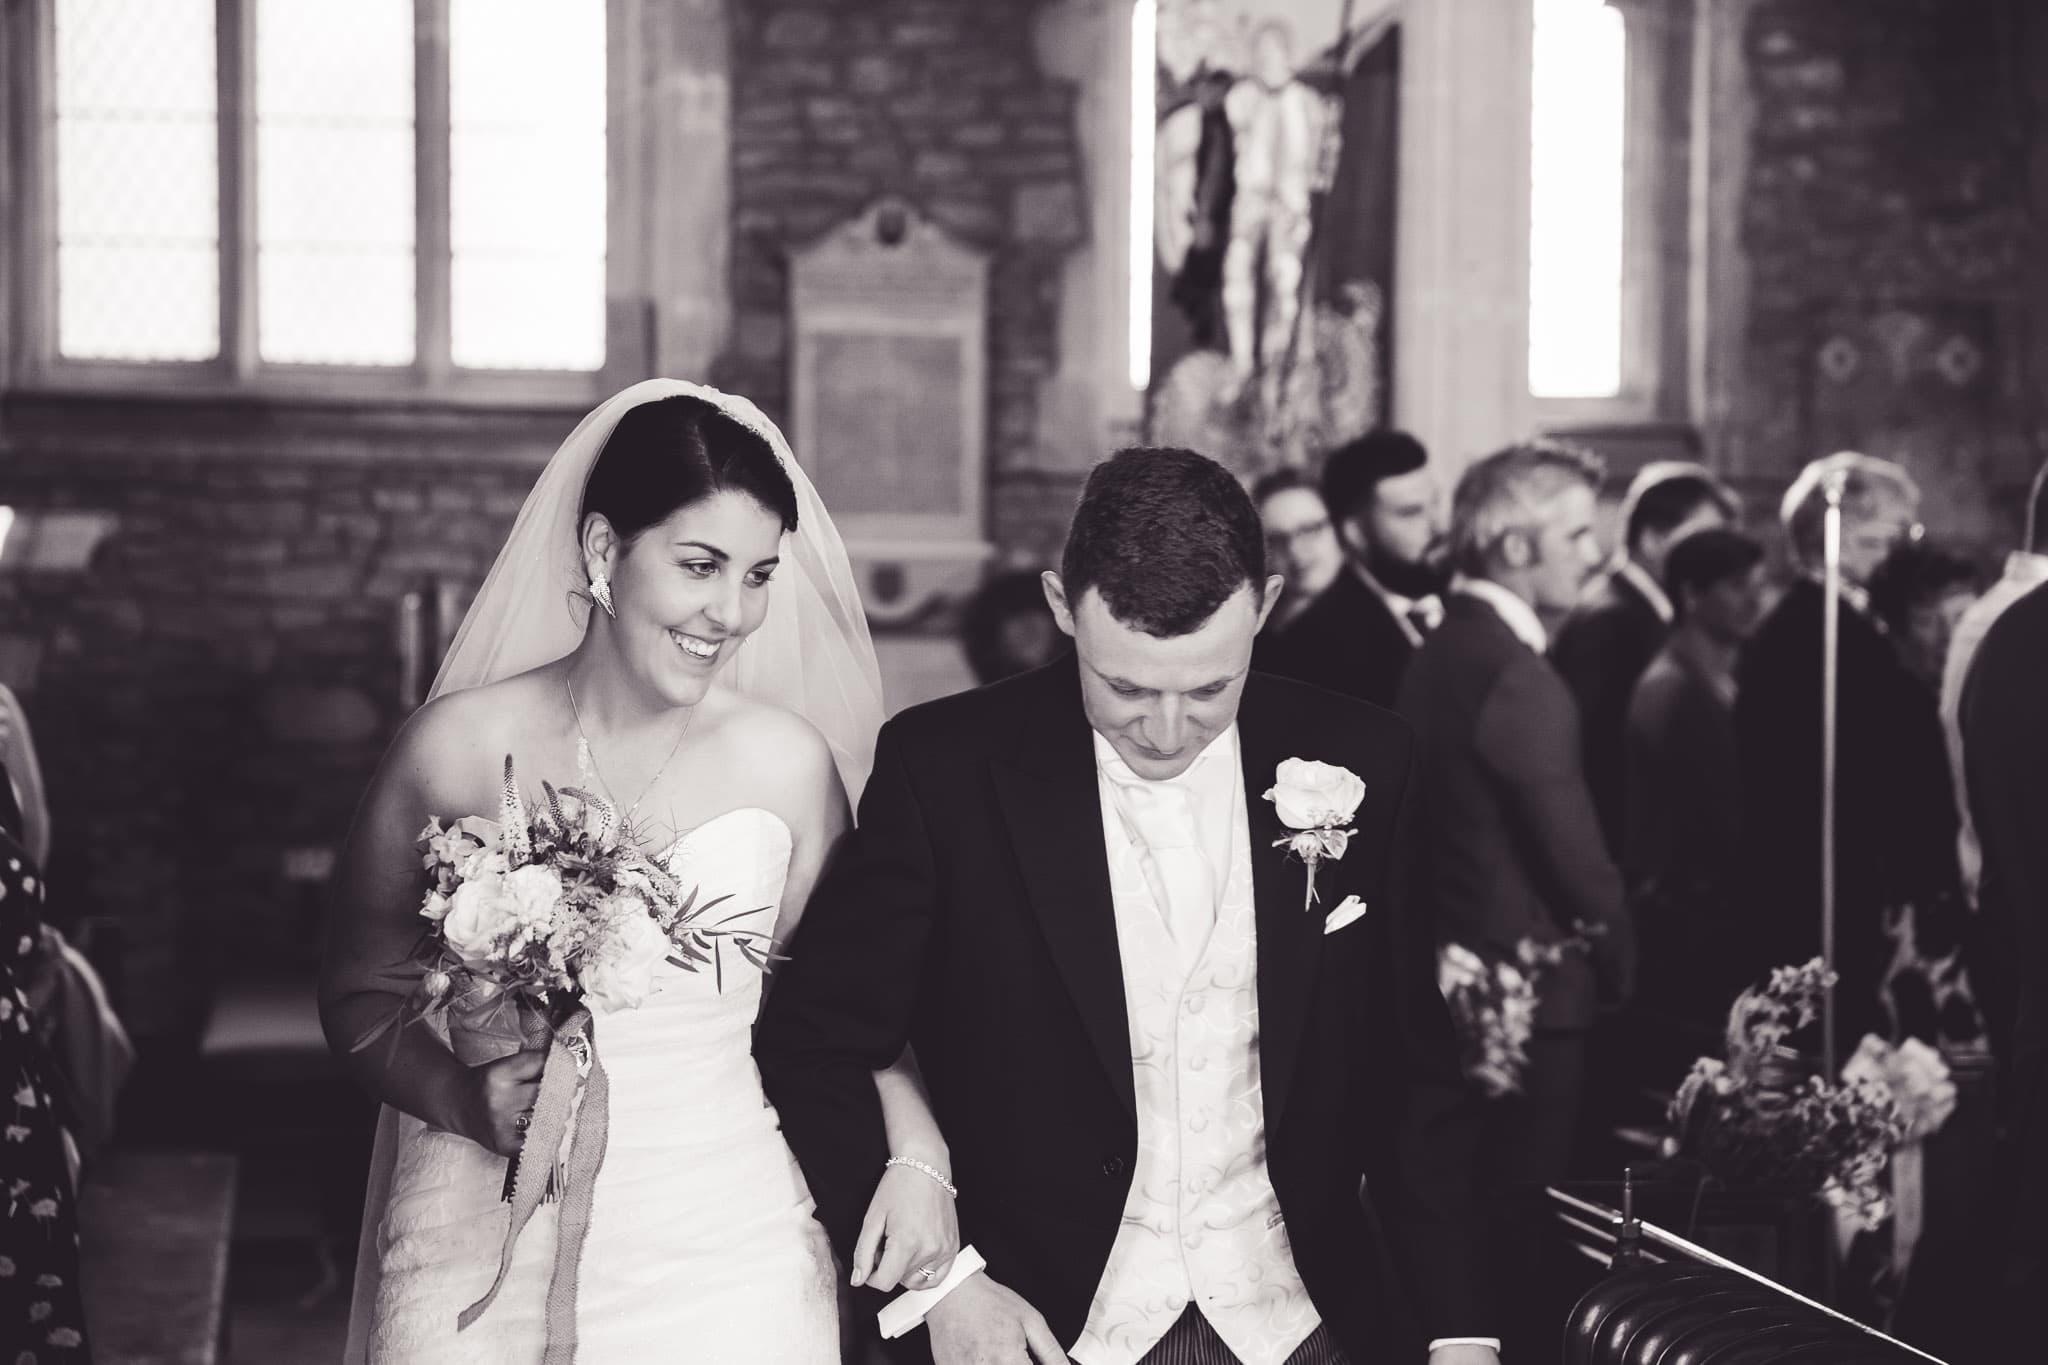 Catherine-George-Wedding-Cannington-Bridgwater-Somerset-Katie-Mortimore-Photography-small-200